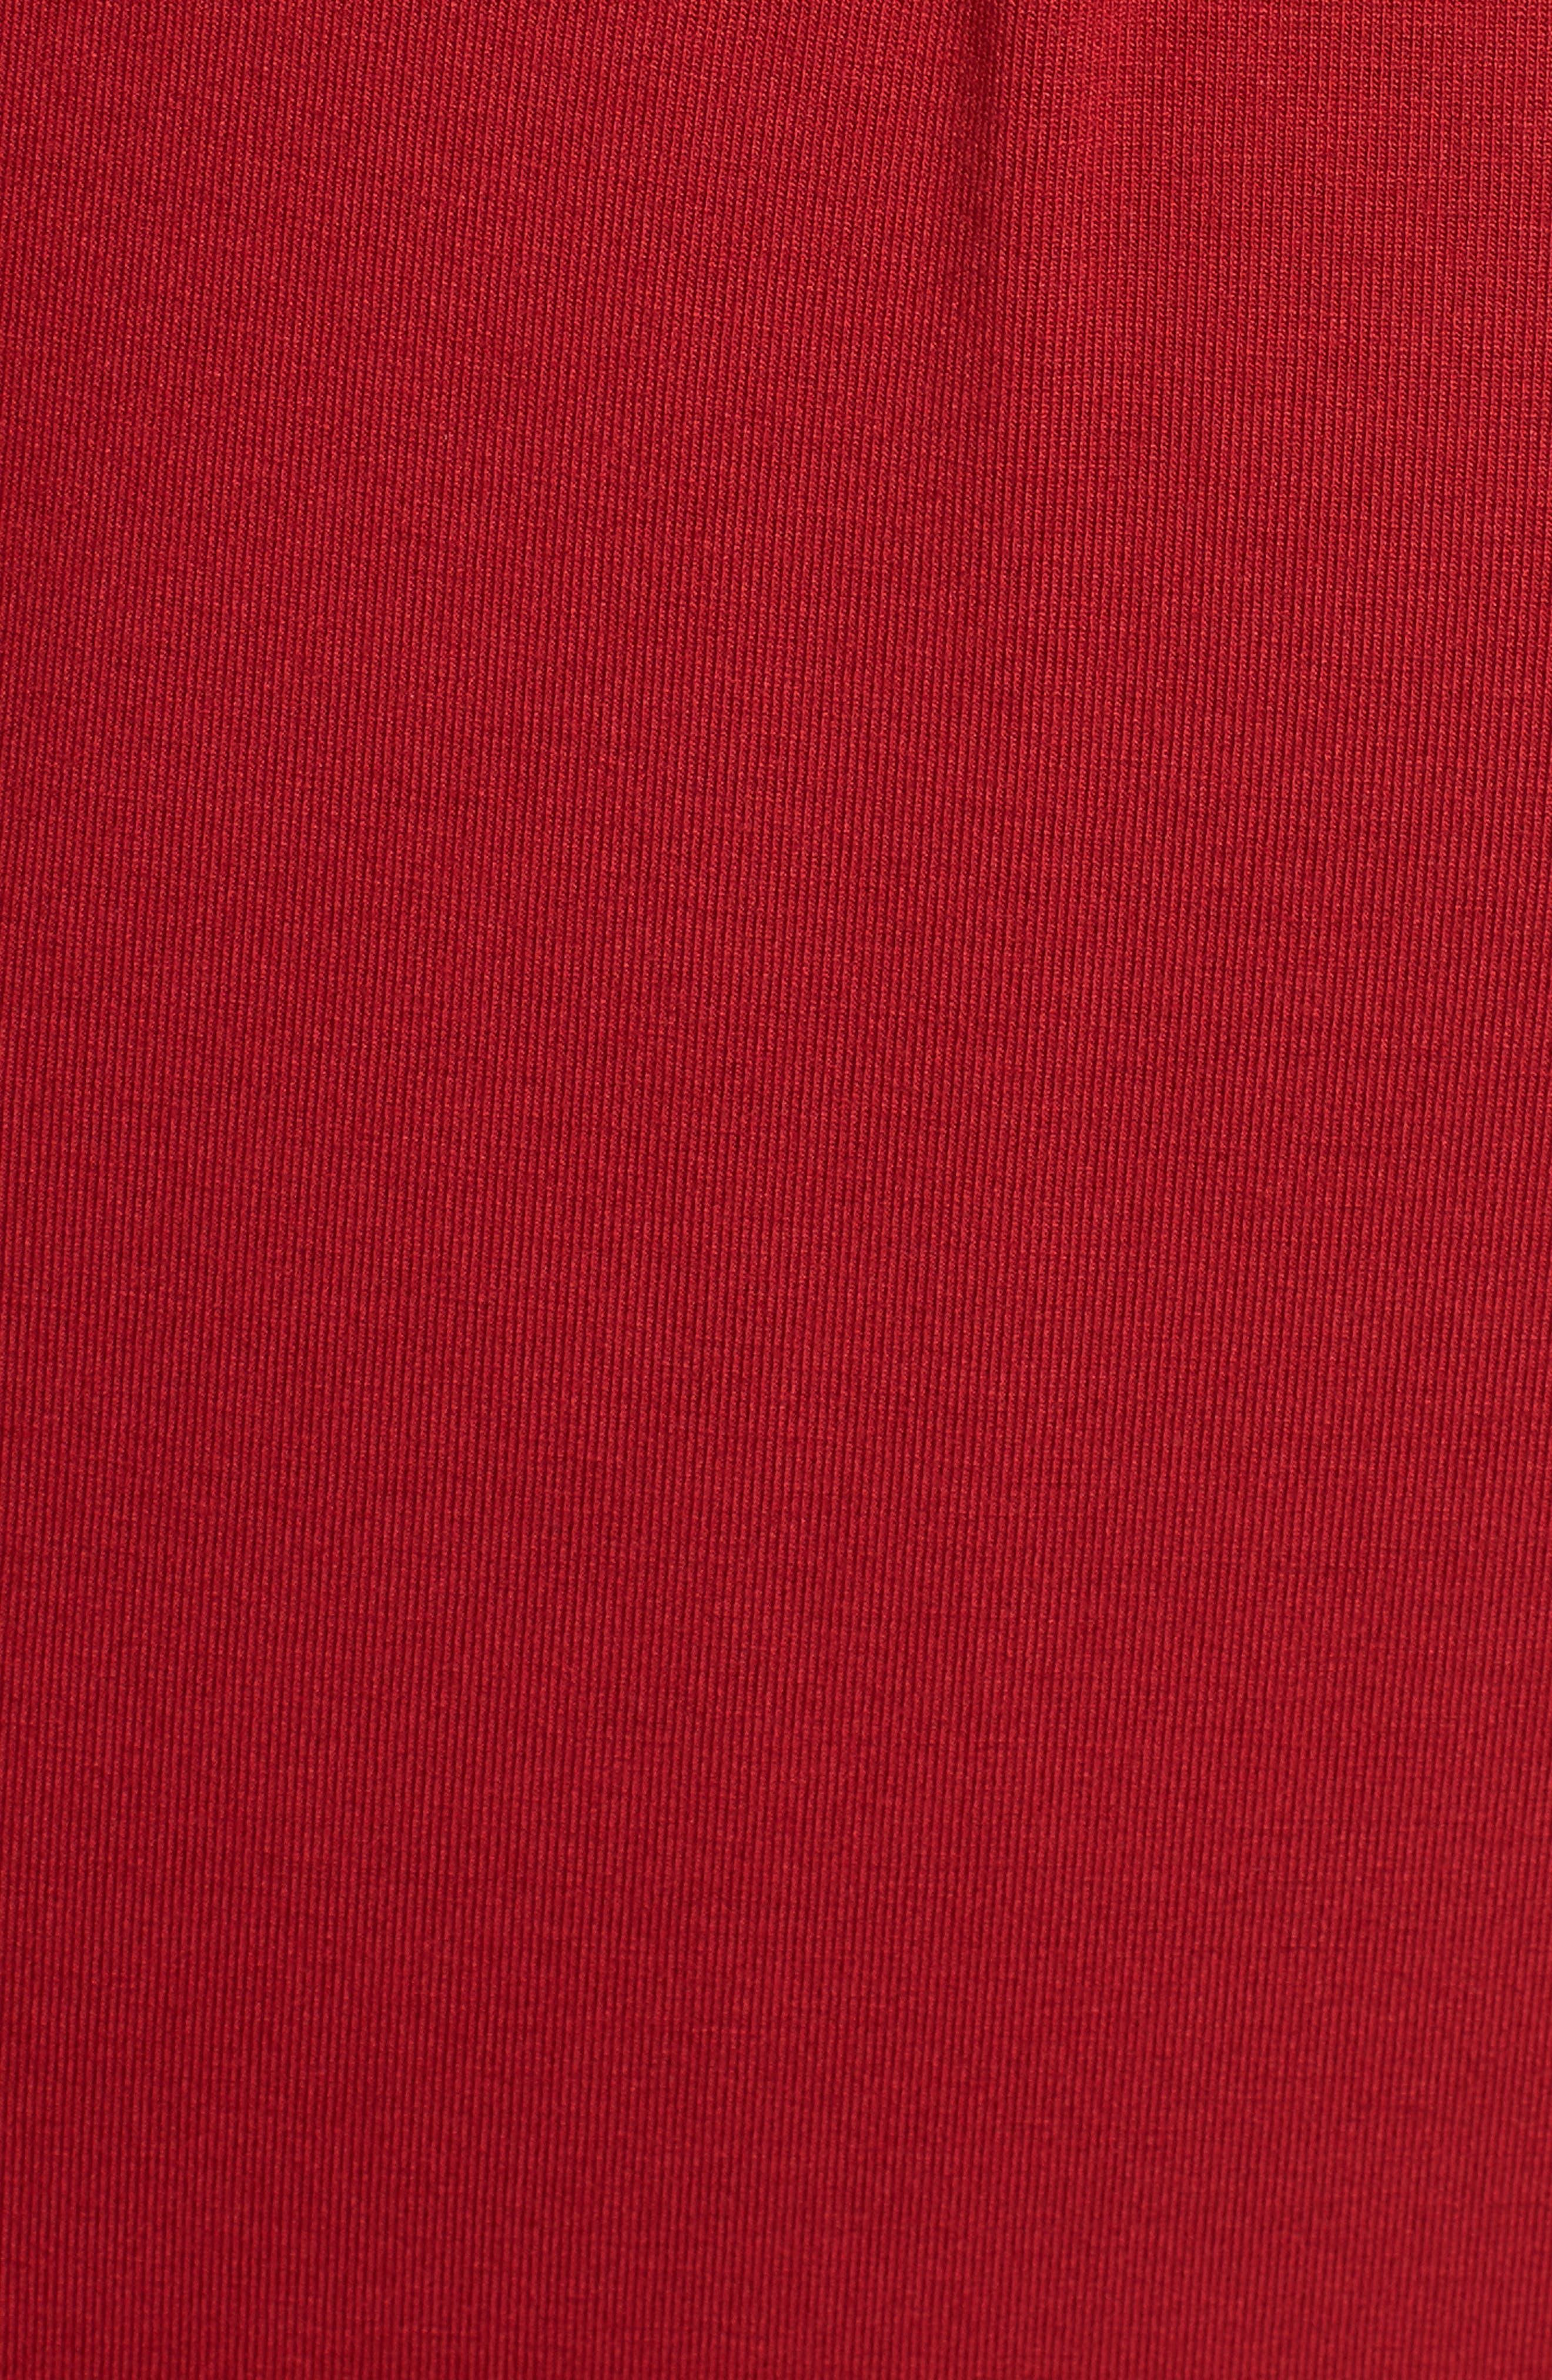 ISABELLA OLIVER,                             Gracia Surplice Maternity Dress,                             Alternate thumbnail 5, color,                             CARDAMOM RED